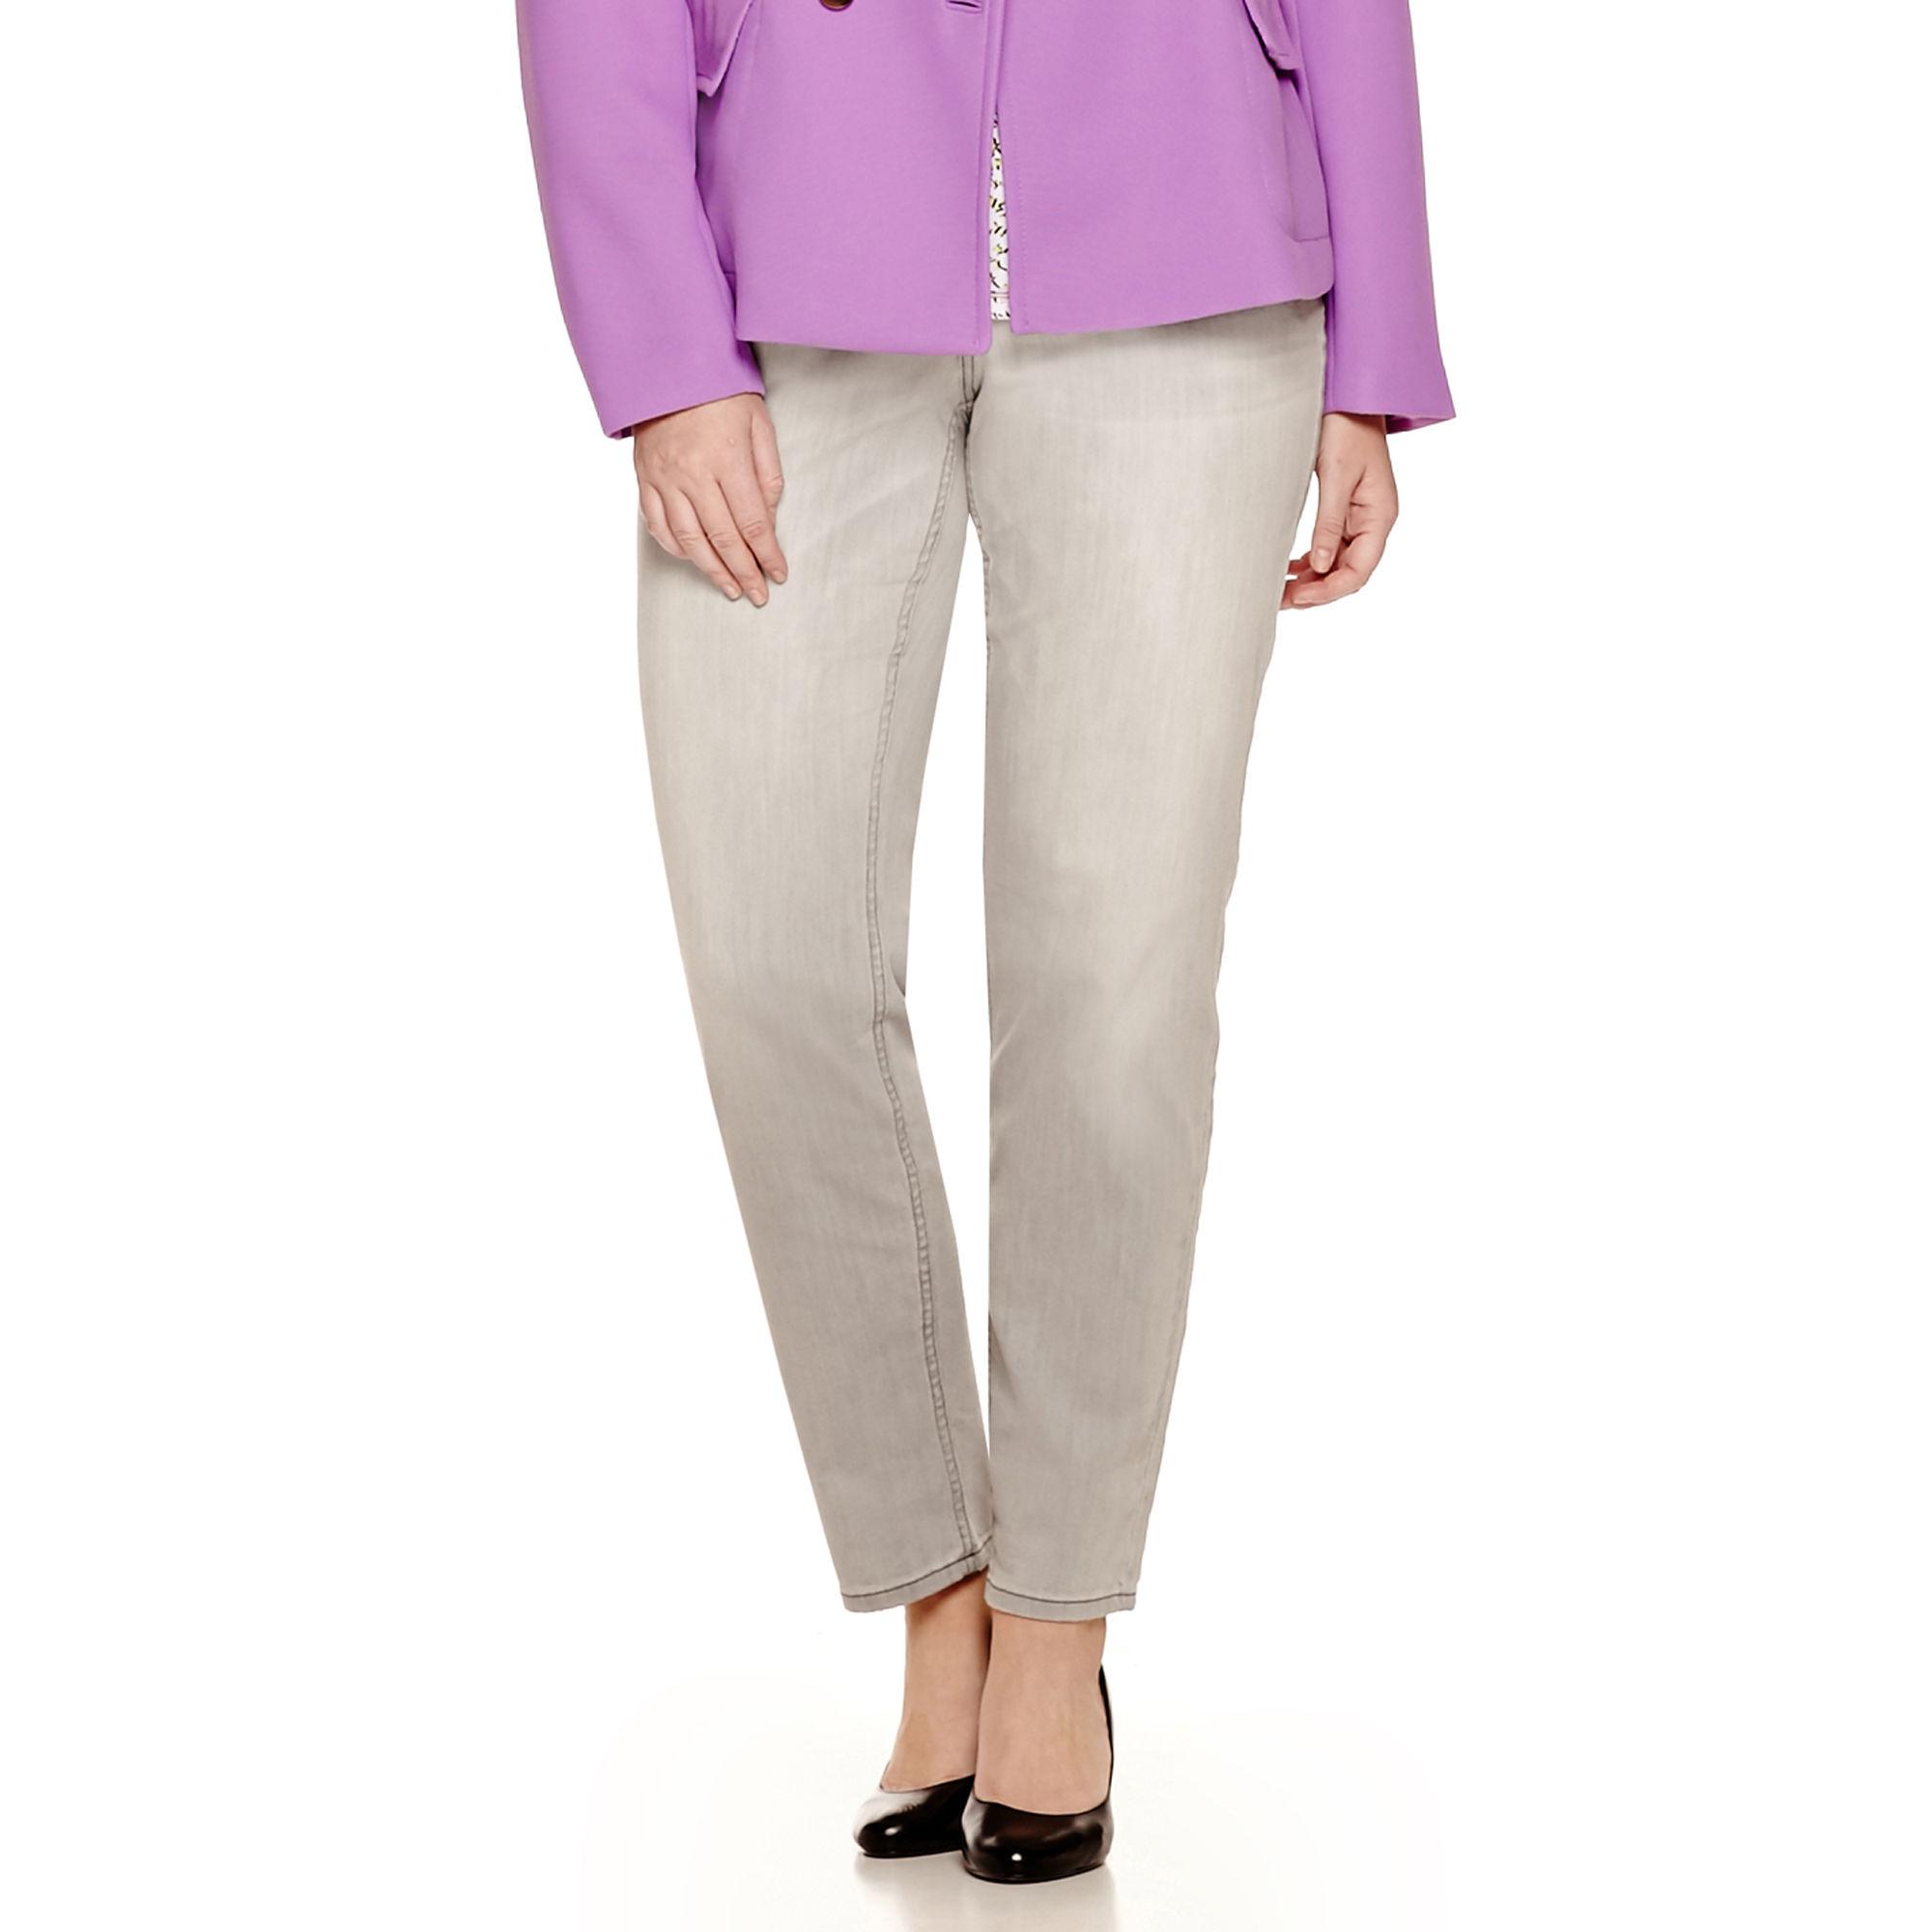 Liz Claiborne City-Fit Skinny Jeans - Plus